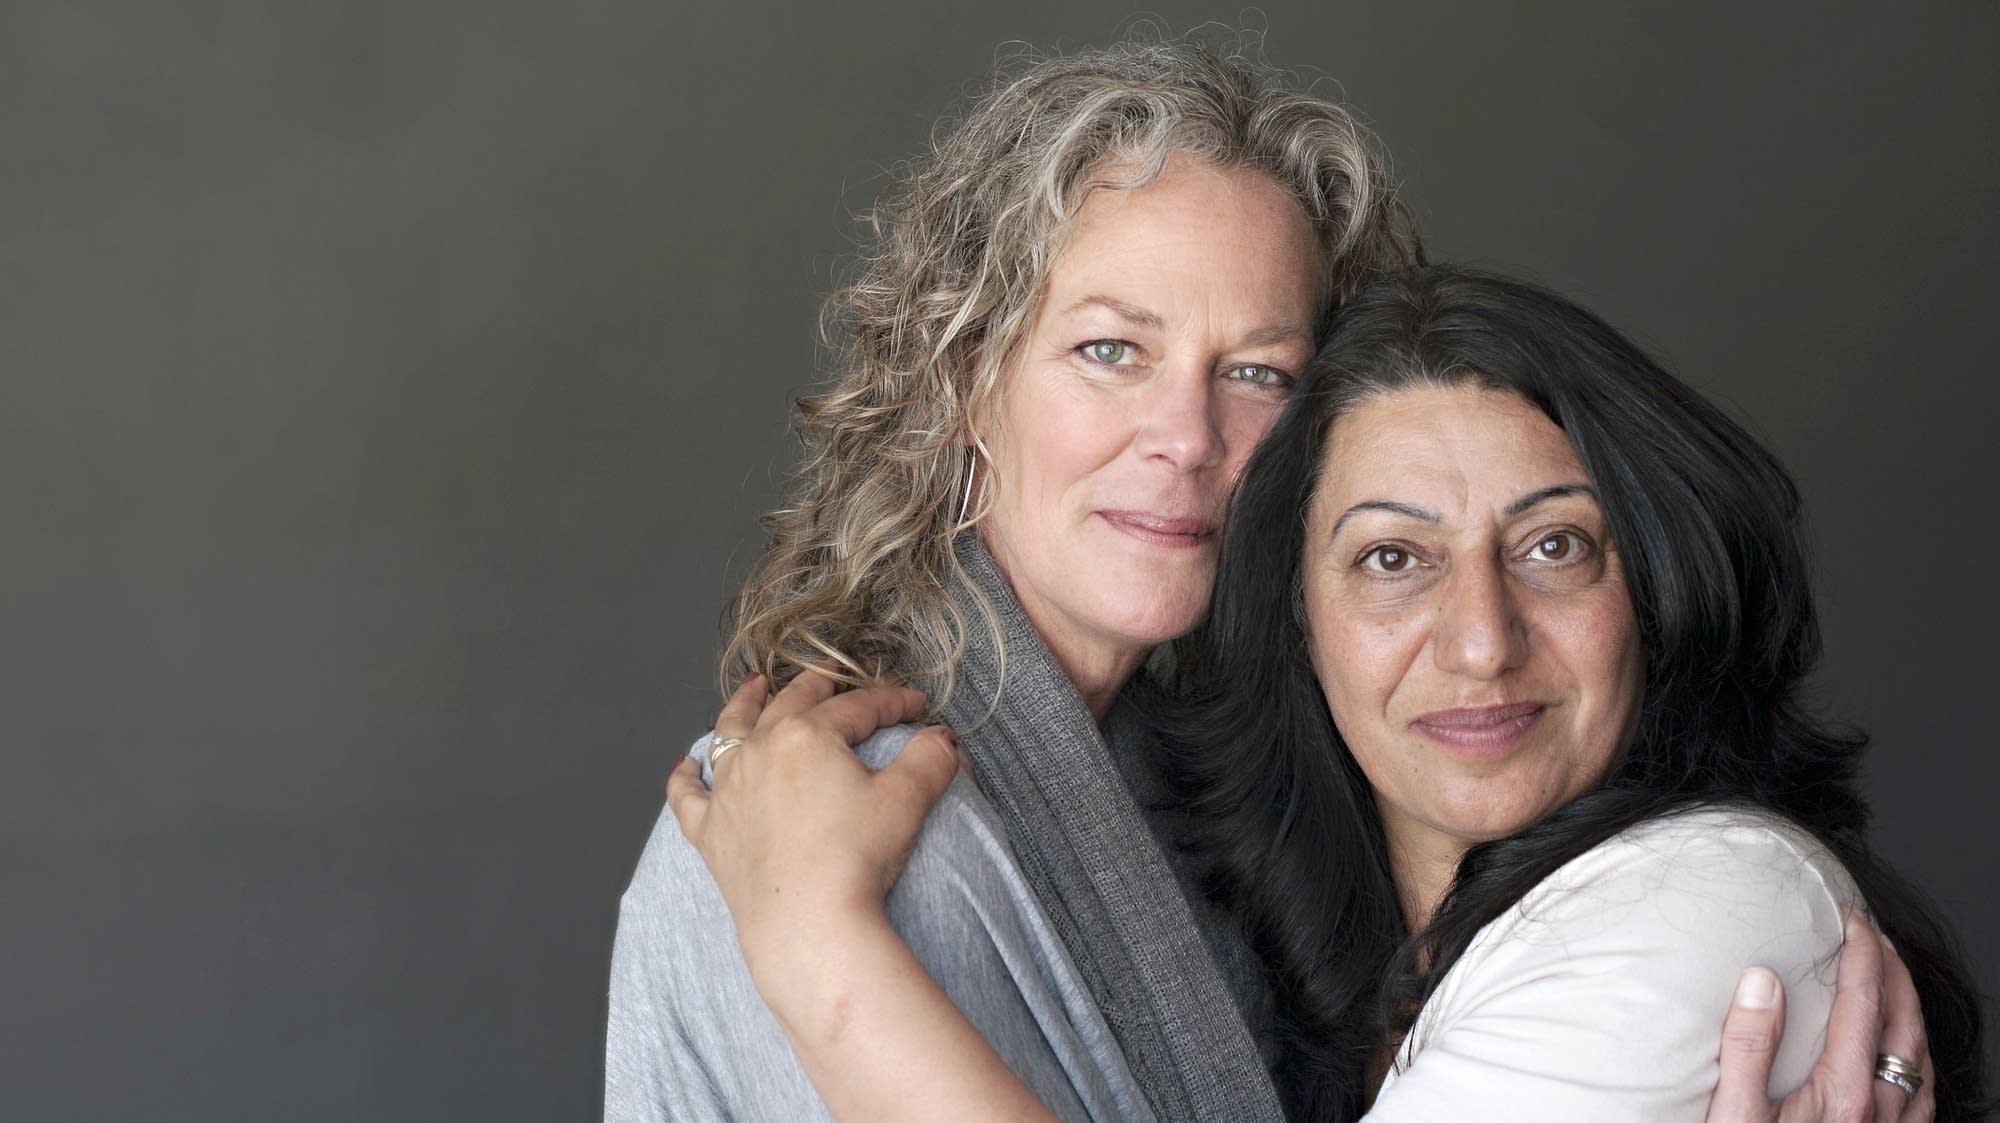 Karen Stoker and Eman Yassin